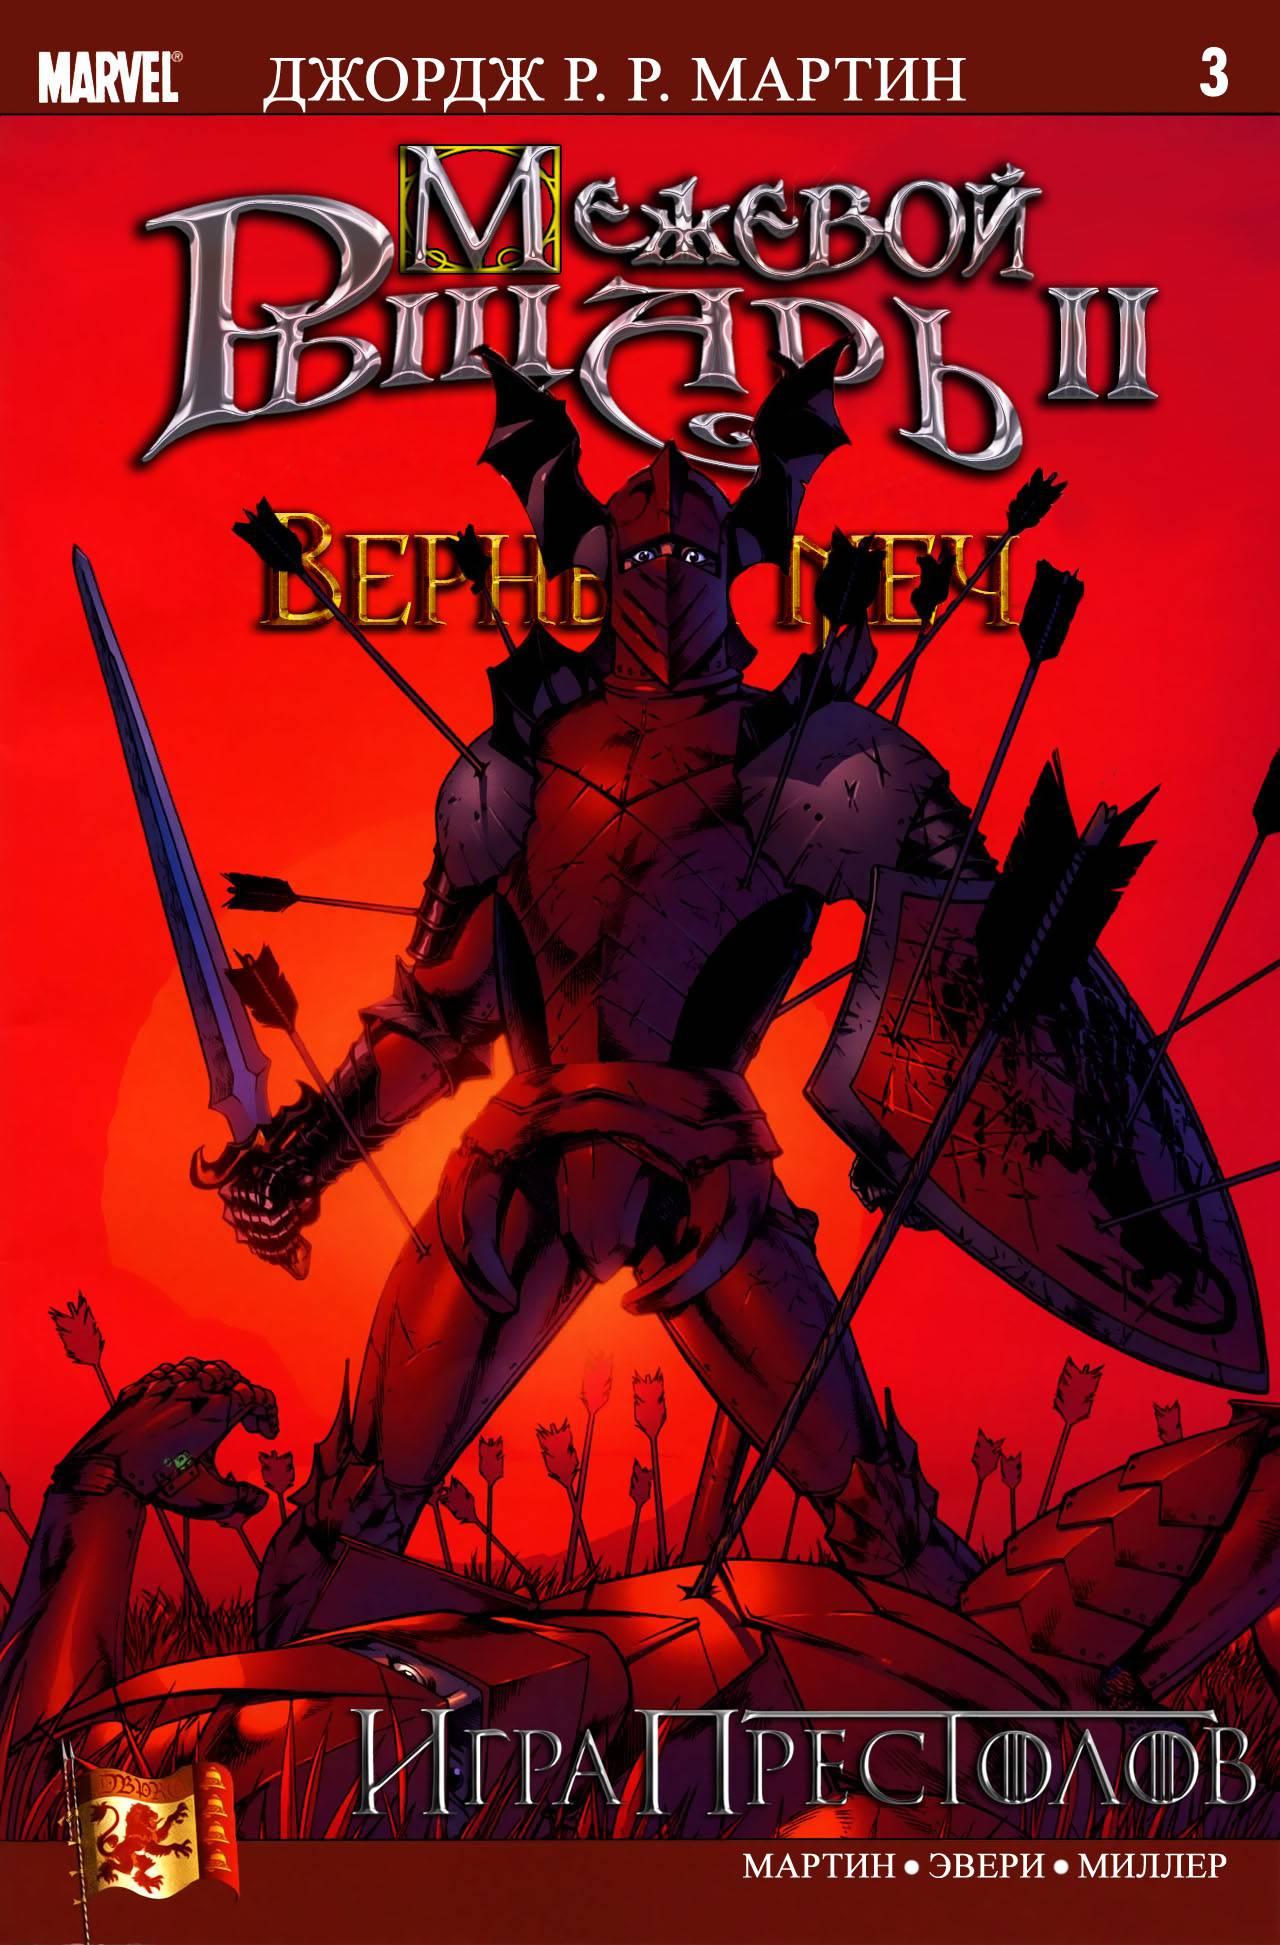 Межевой Рыцарь II: Верный Меч №3 онлайн